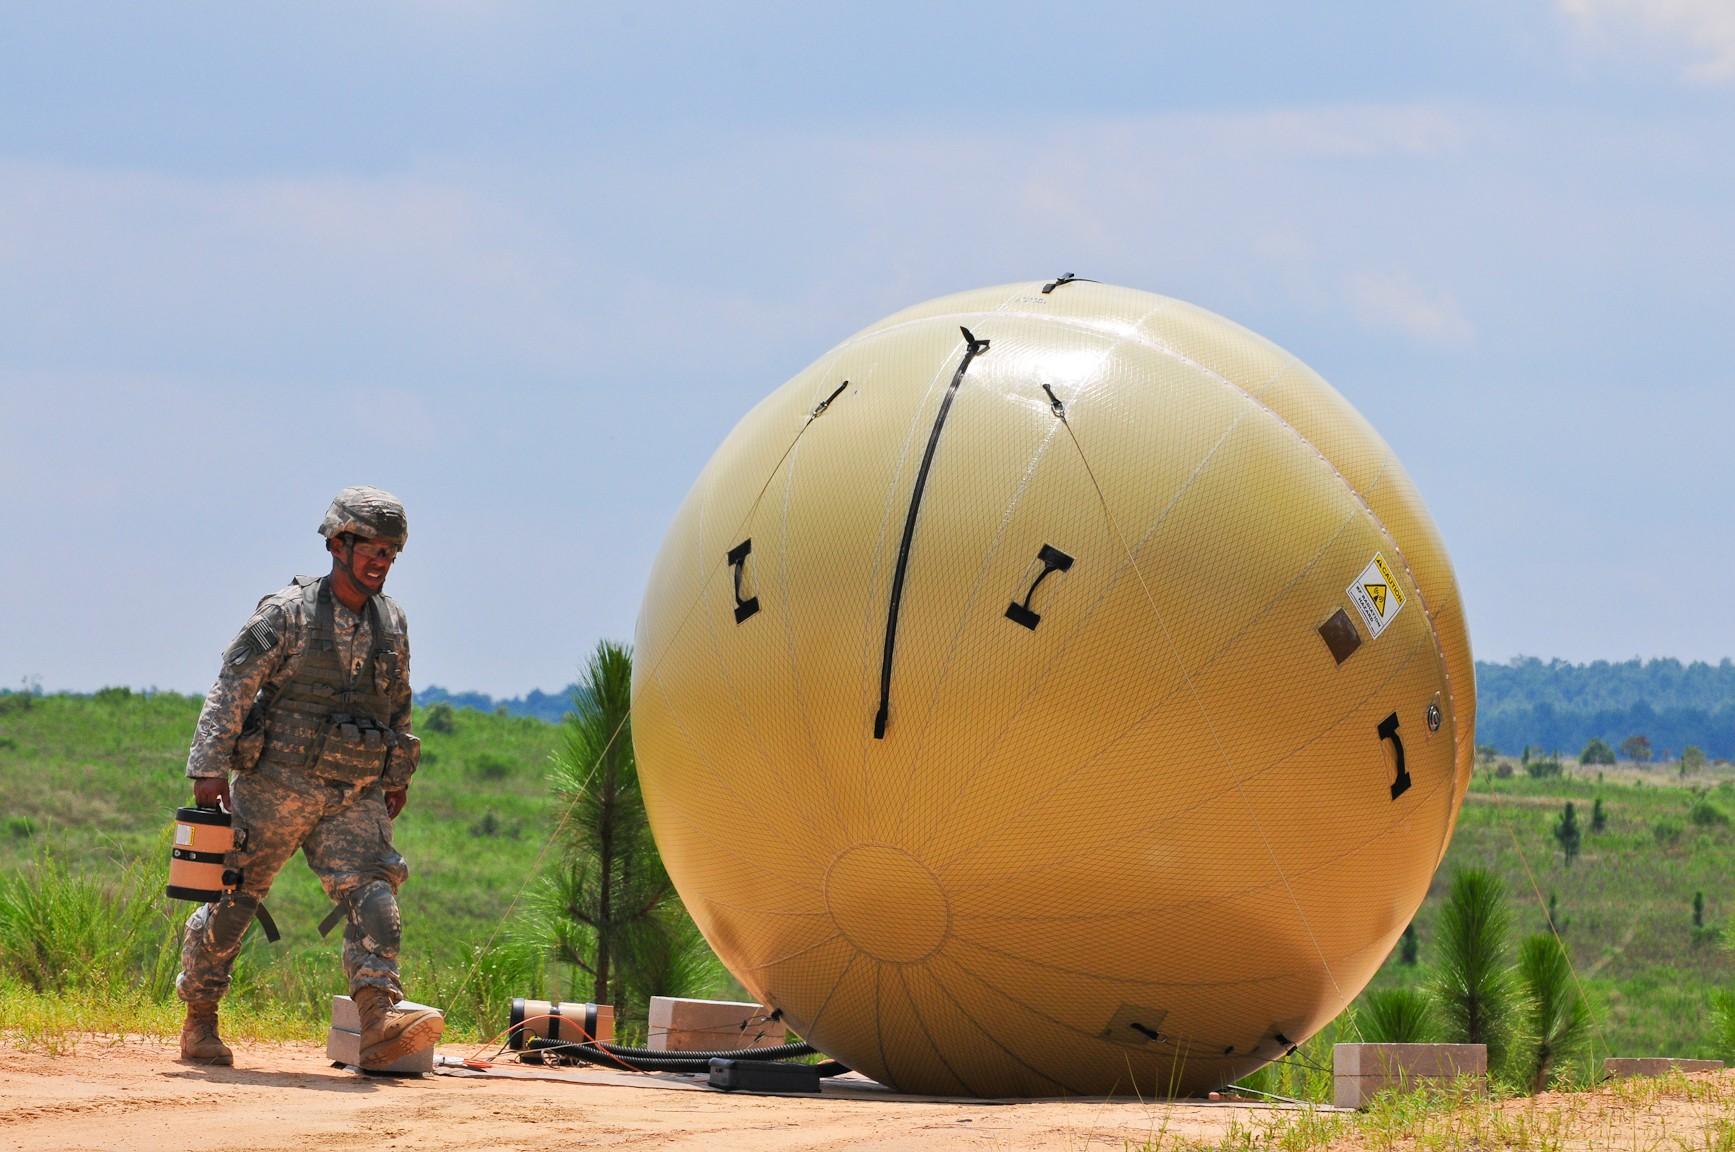 www.army.mil/e2/c/images/2015/12/18/419279/original.jpg